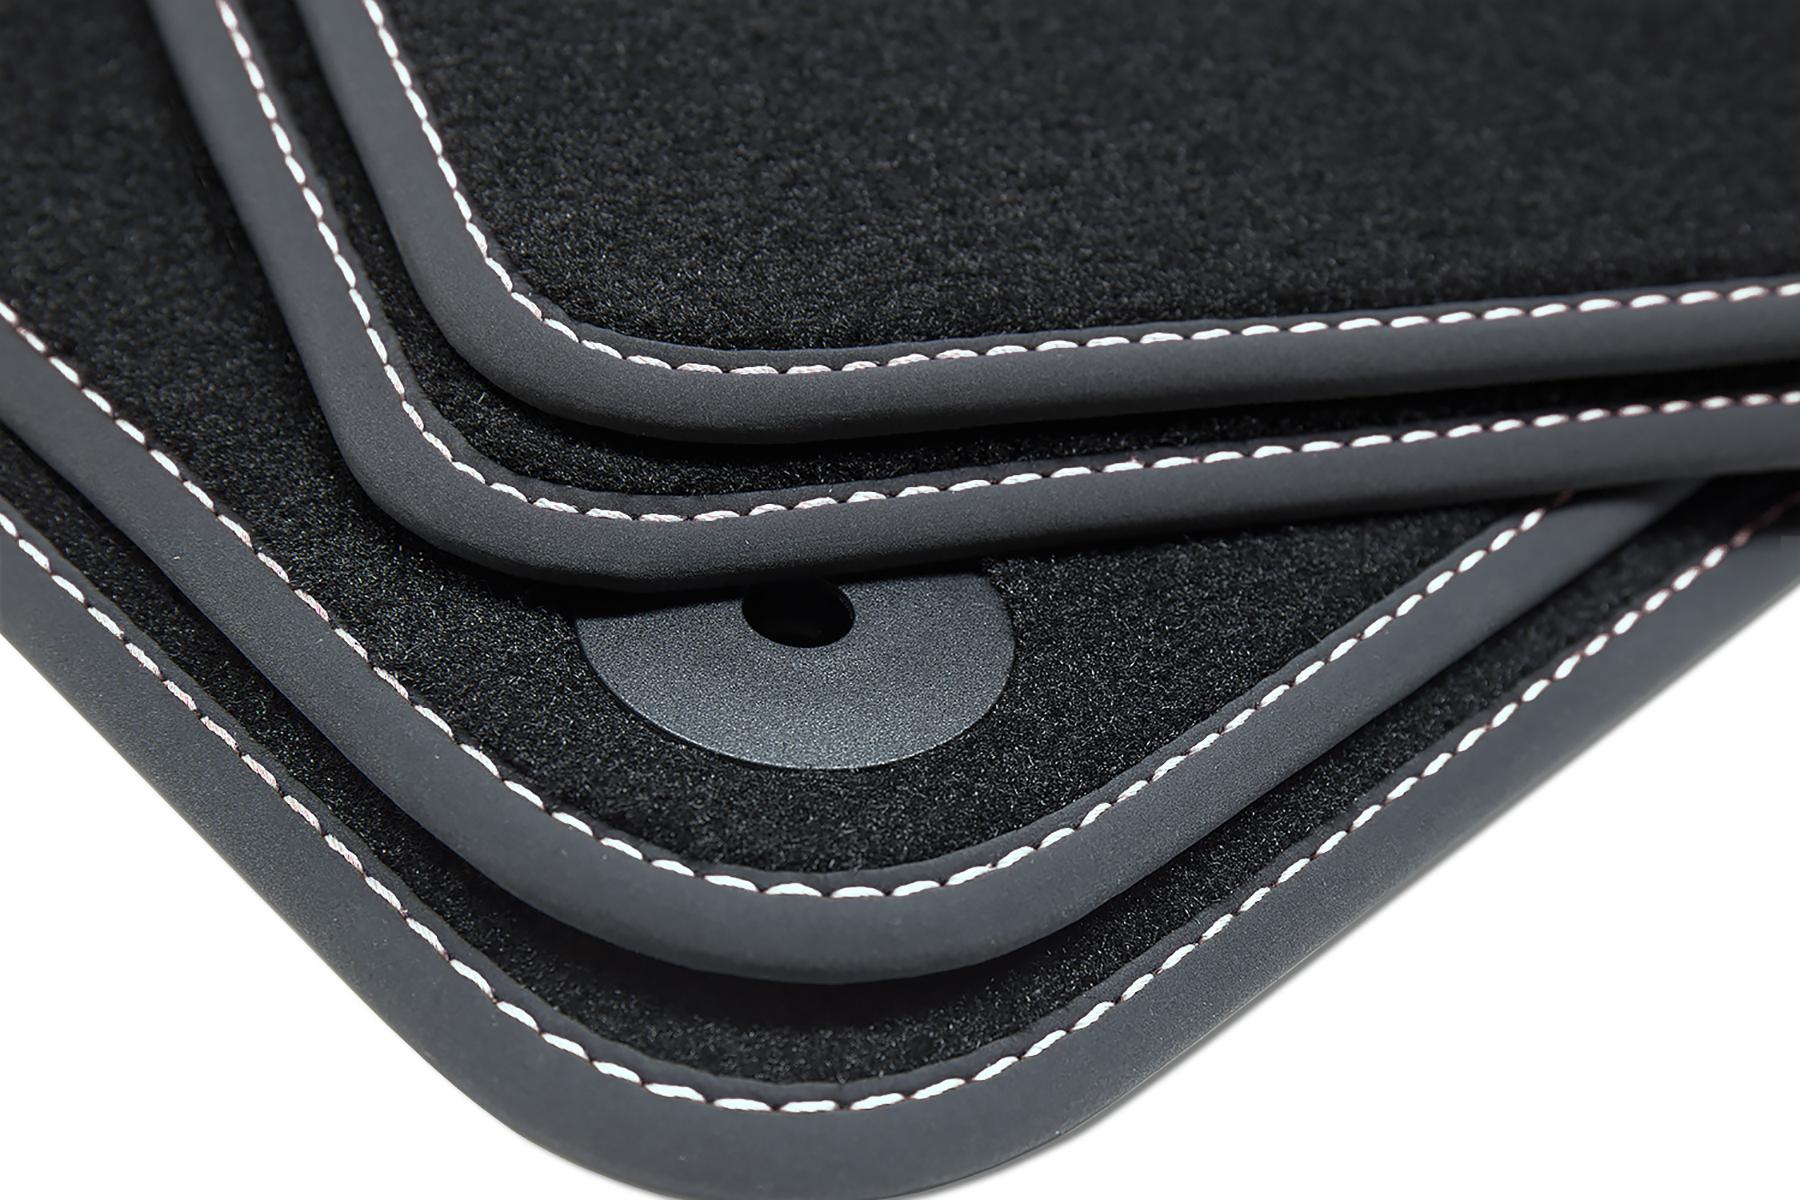 tapis de sol en hiver adapt pour vw golf v golf vi scirocco iii tapis de sol pour vw tapis de. Black Bedroom Furniture Sets. Home Design Ideas